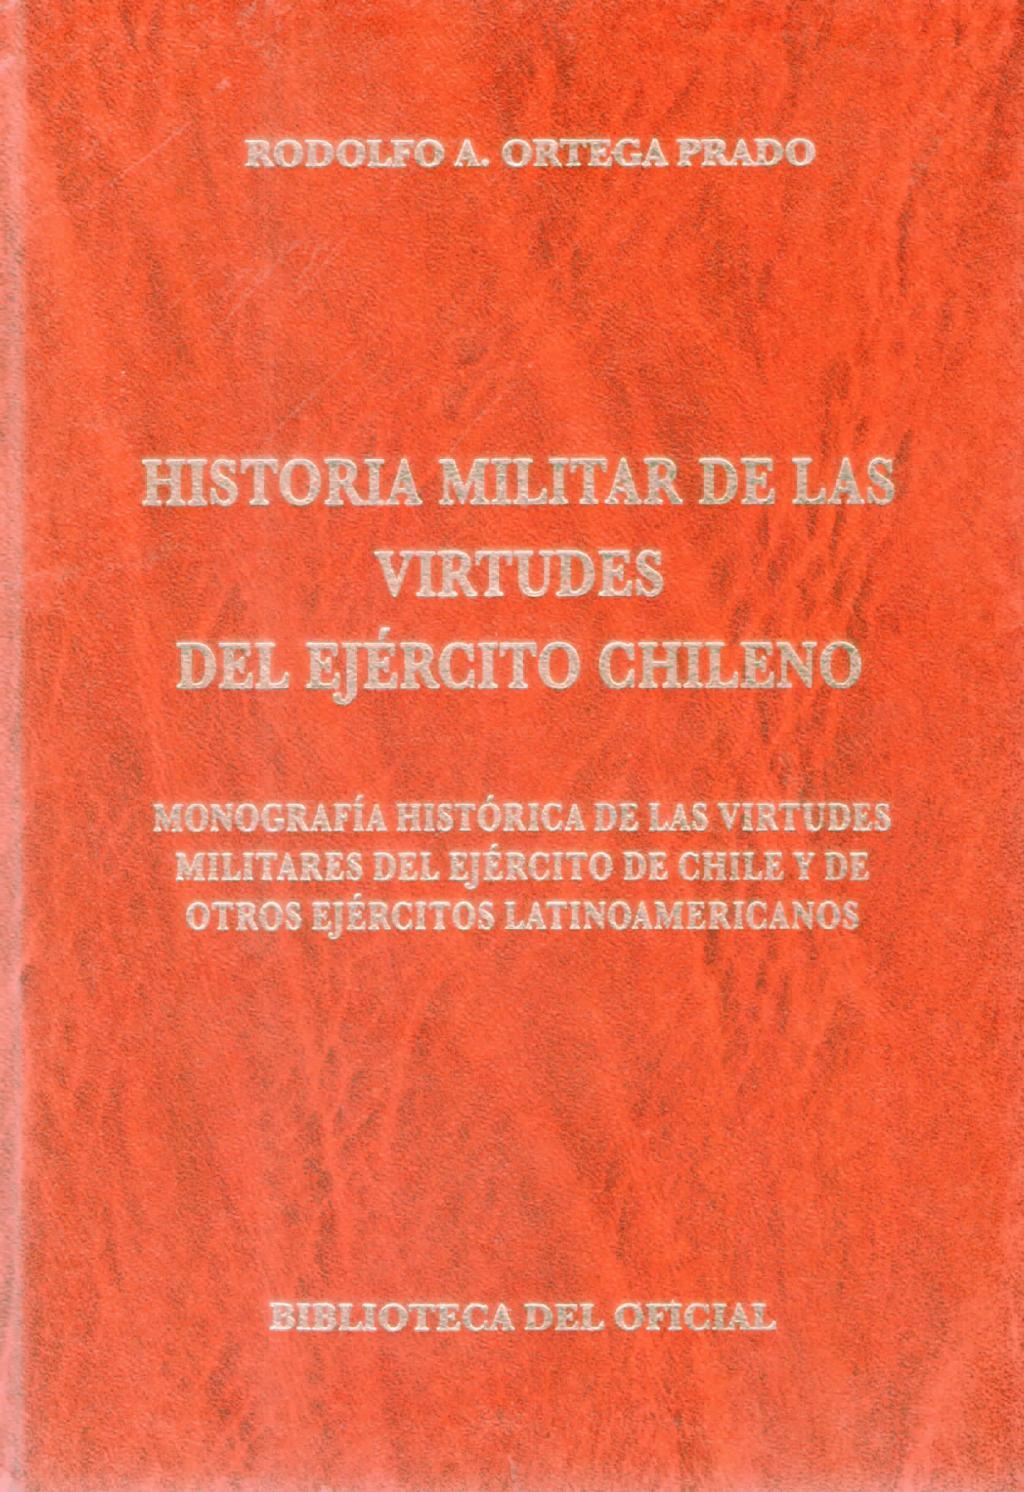 Historia Militar de la Virtudes del Ejército Chile autor: Rodolfo ...